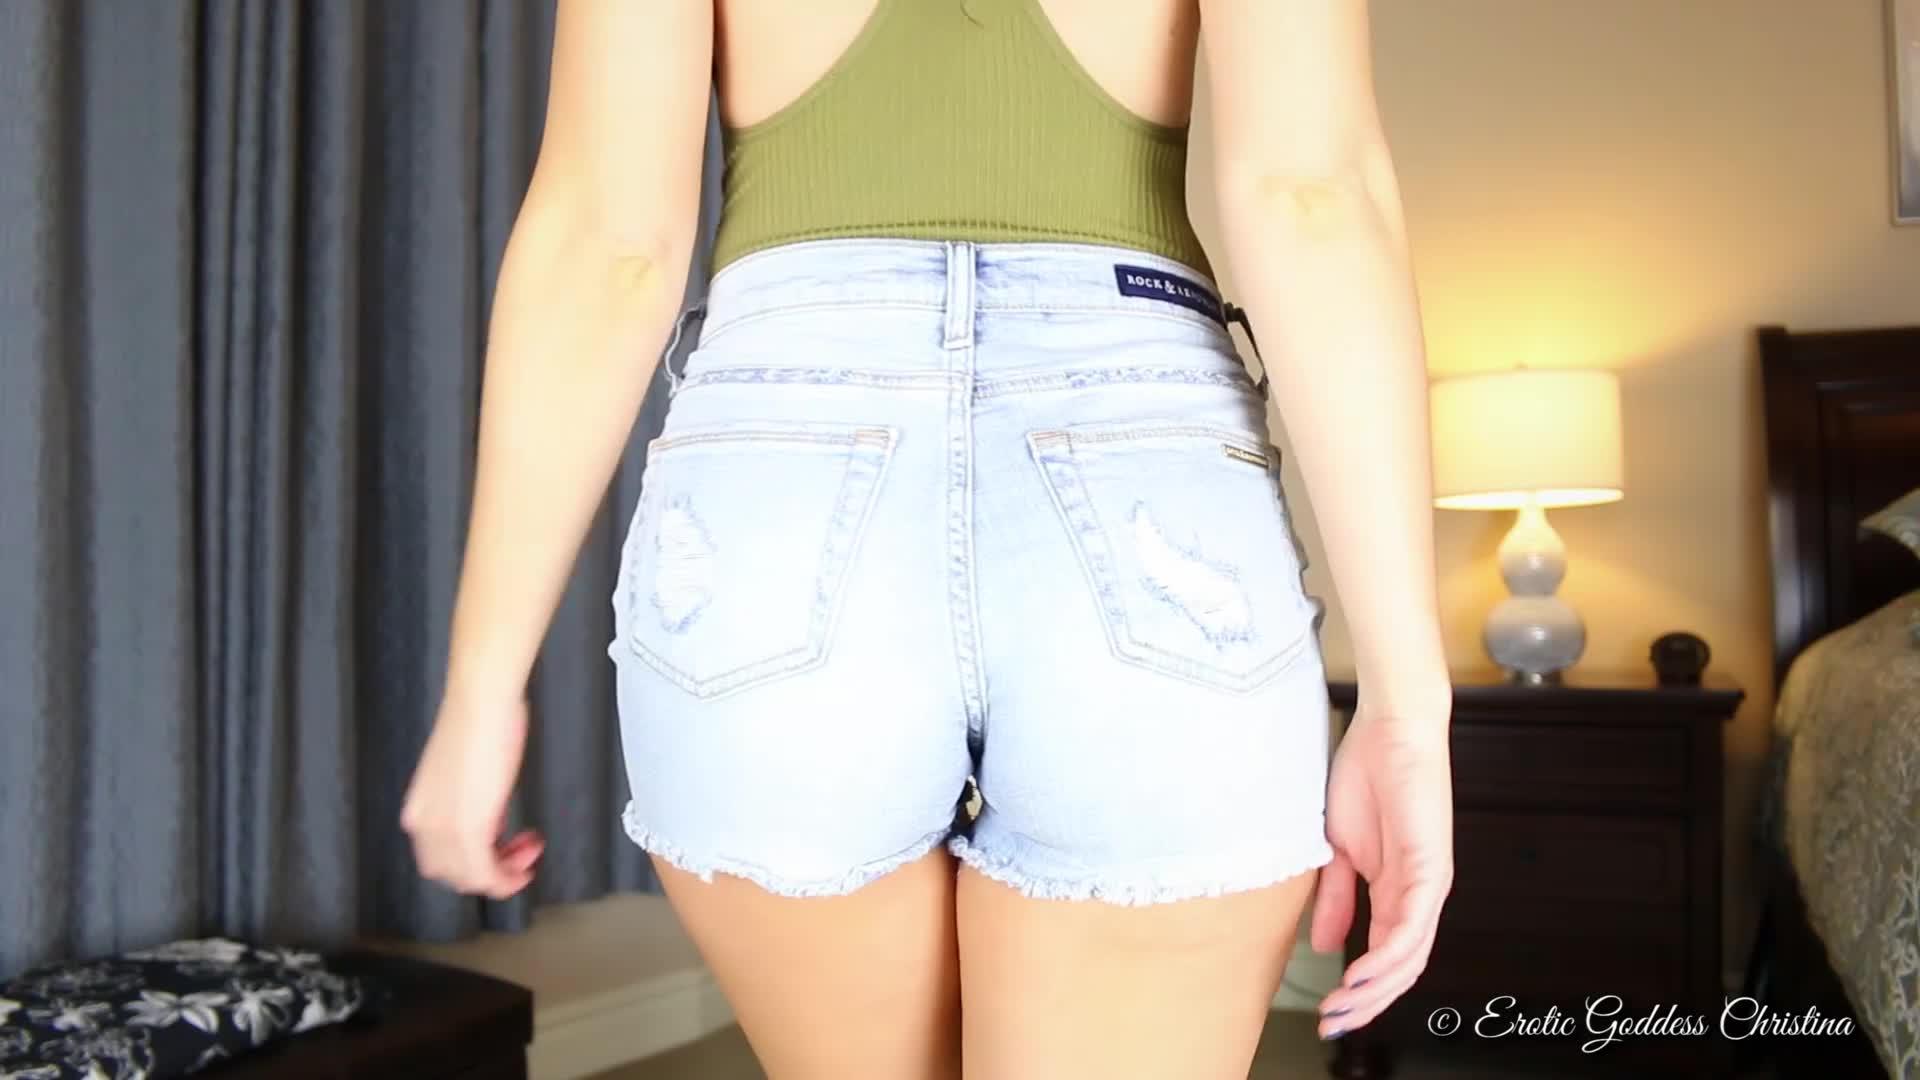 Big Ass Tight Jeans Ebony